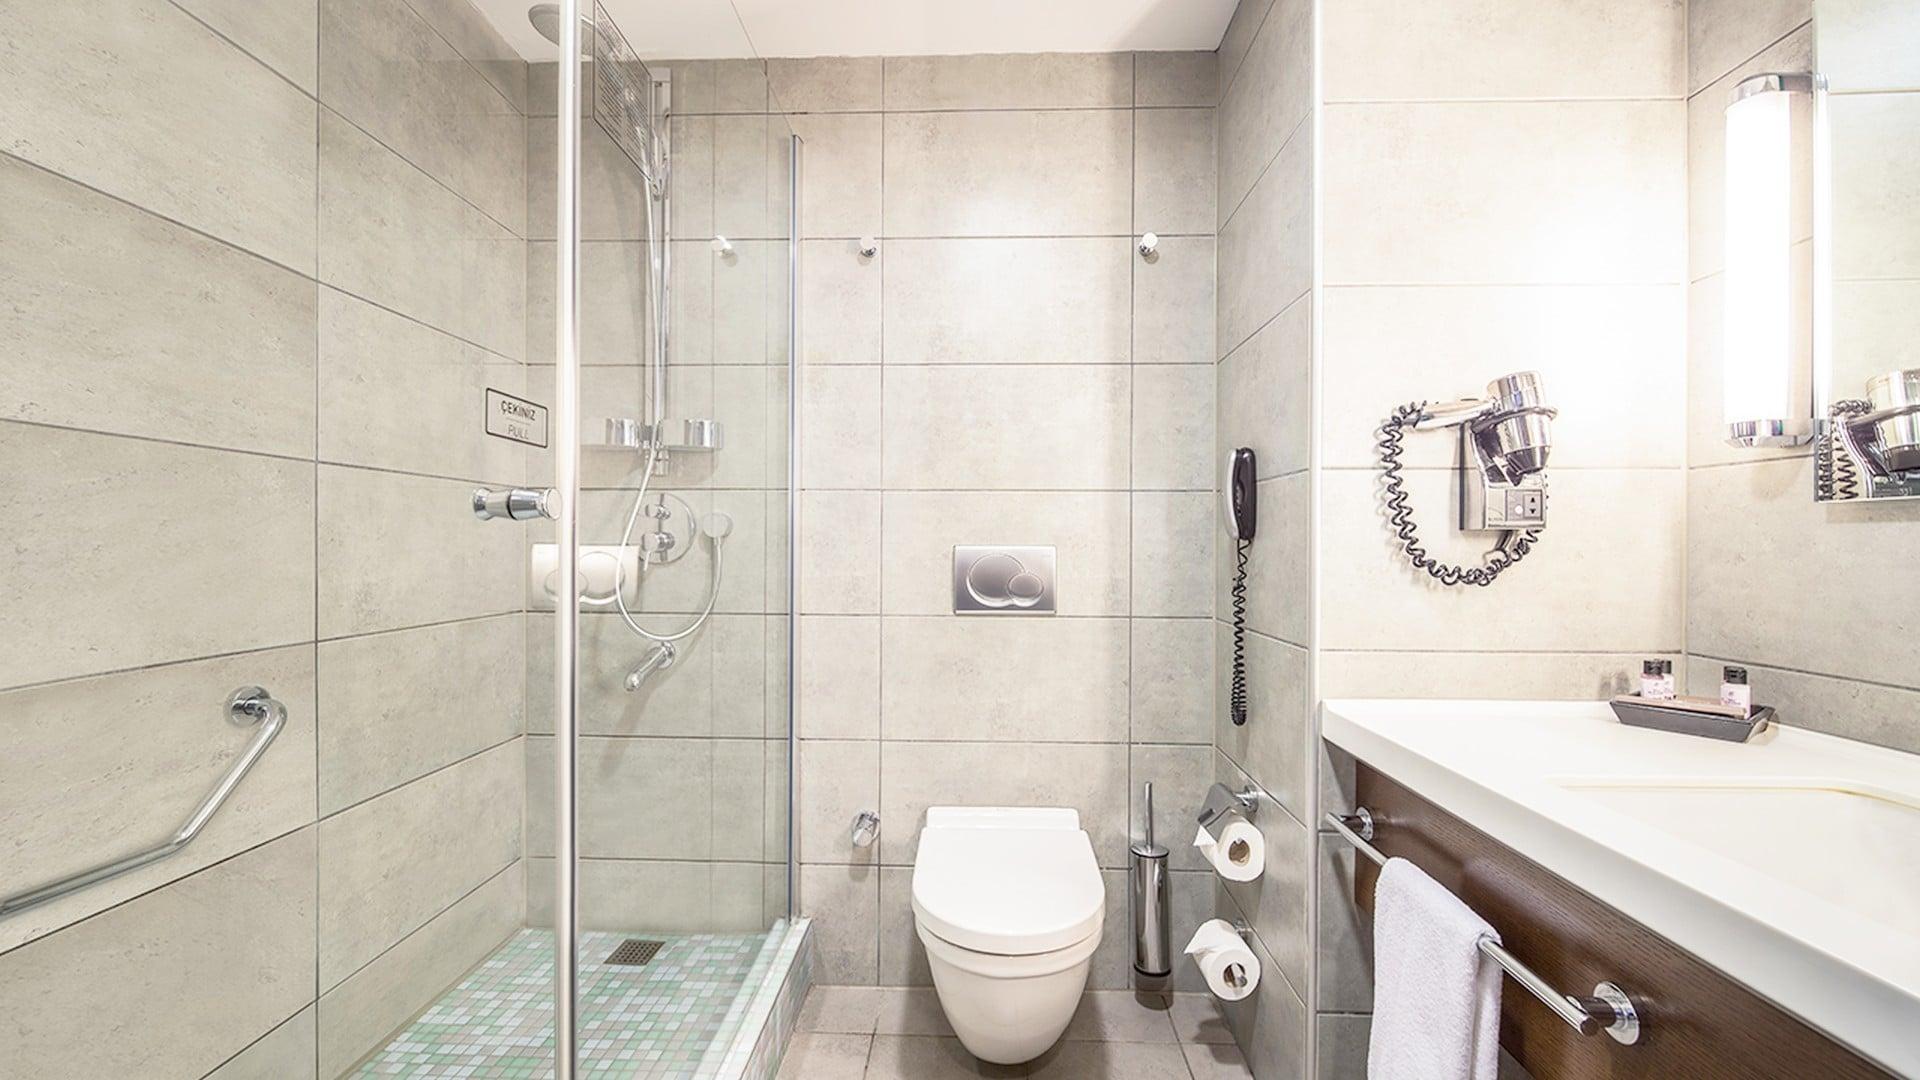 Midtown Hotel Bosphorus Sea View Deluxe Room Bathroom